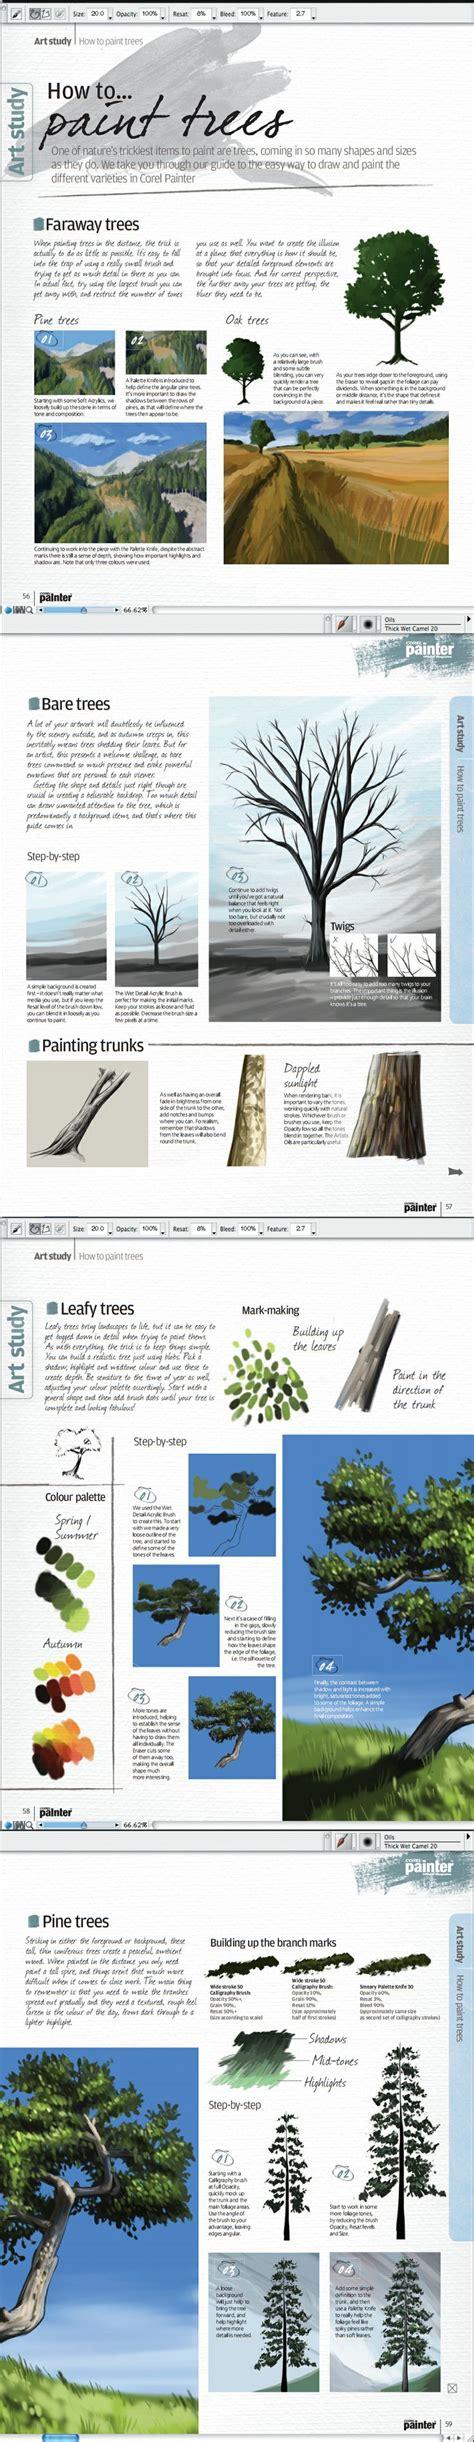 tutorial watercolor coreldraw 54 best painter tutorials images on pinterest corel